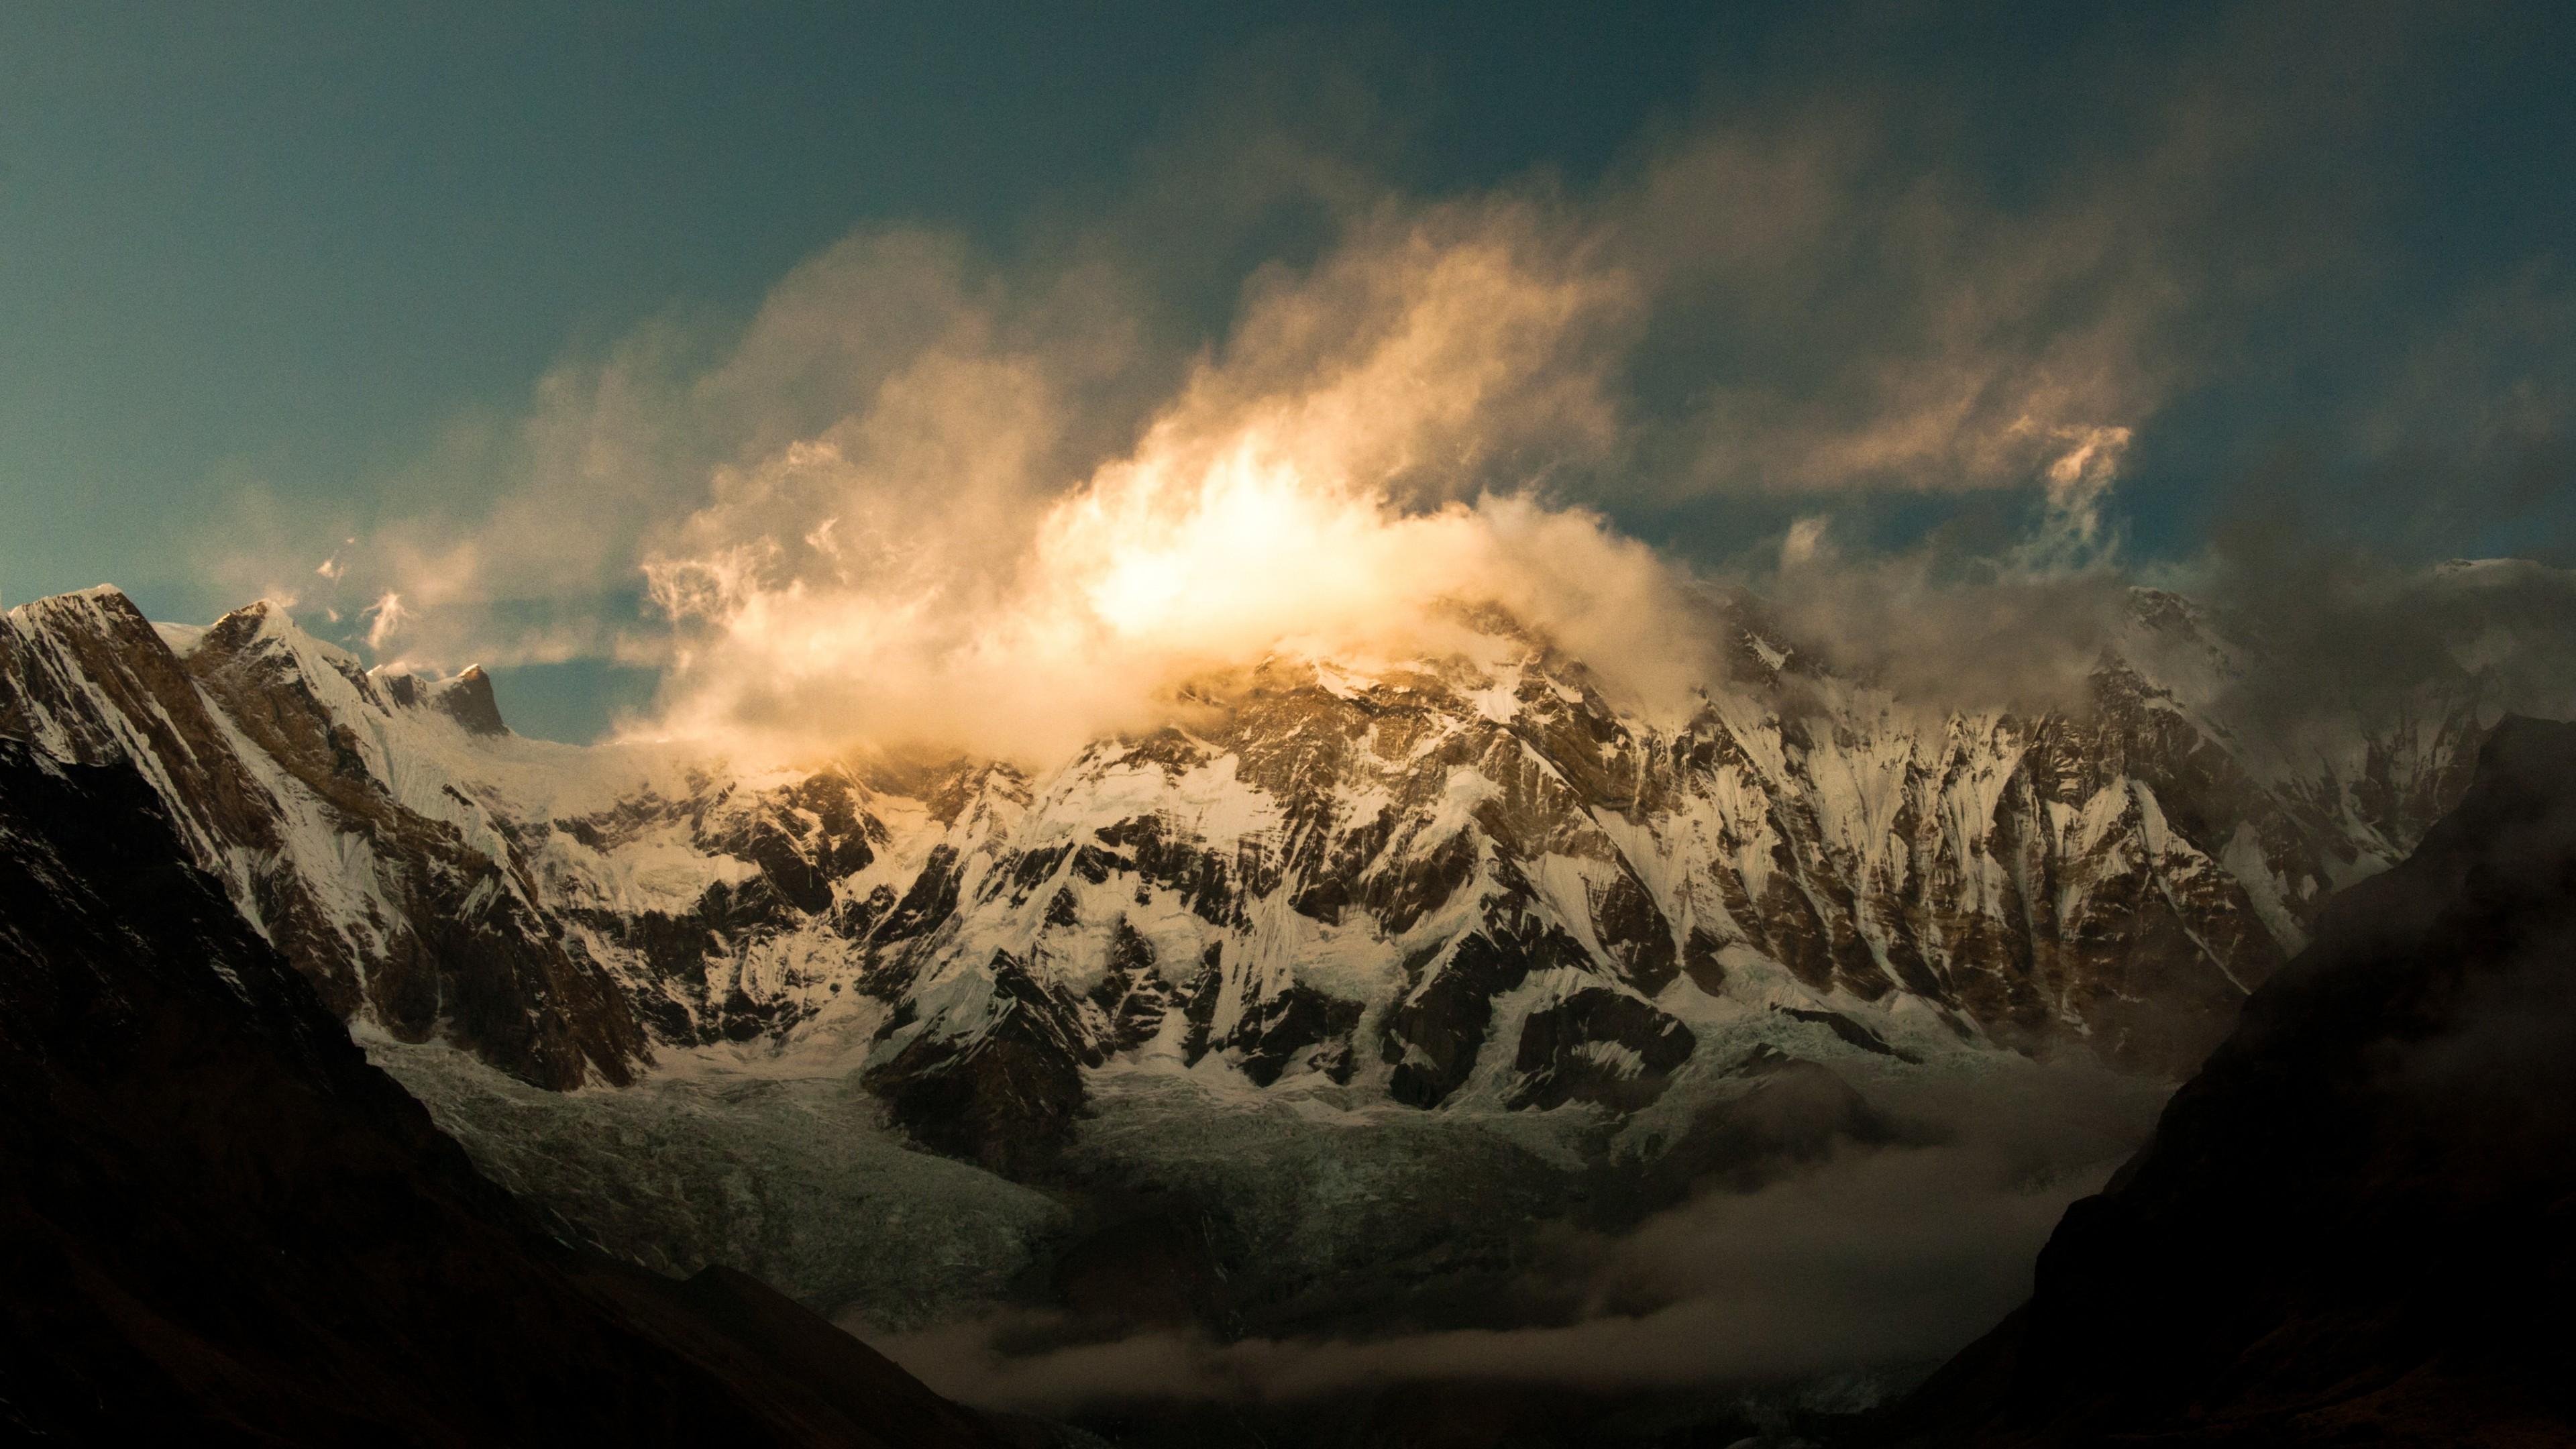 720x1280 Hd Wallpapers Quotes Wallpaper Annapurna 5k 4k Wallpaper Himalayas Nepal